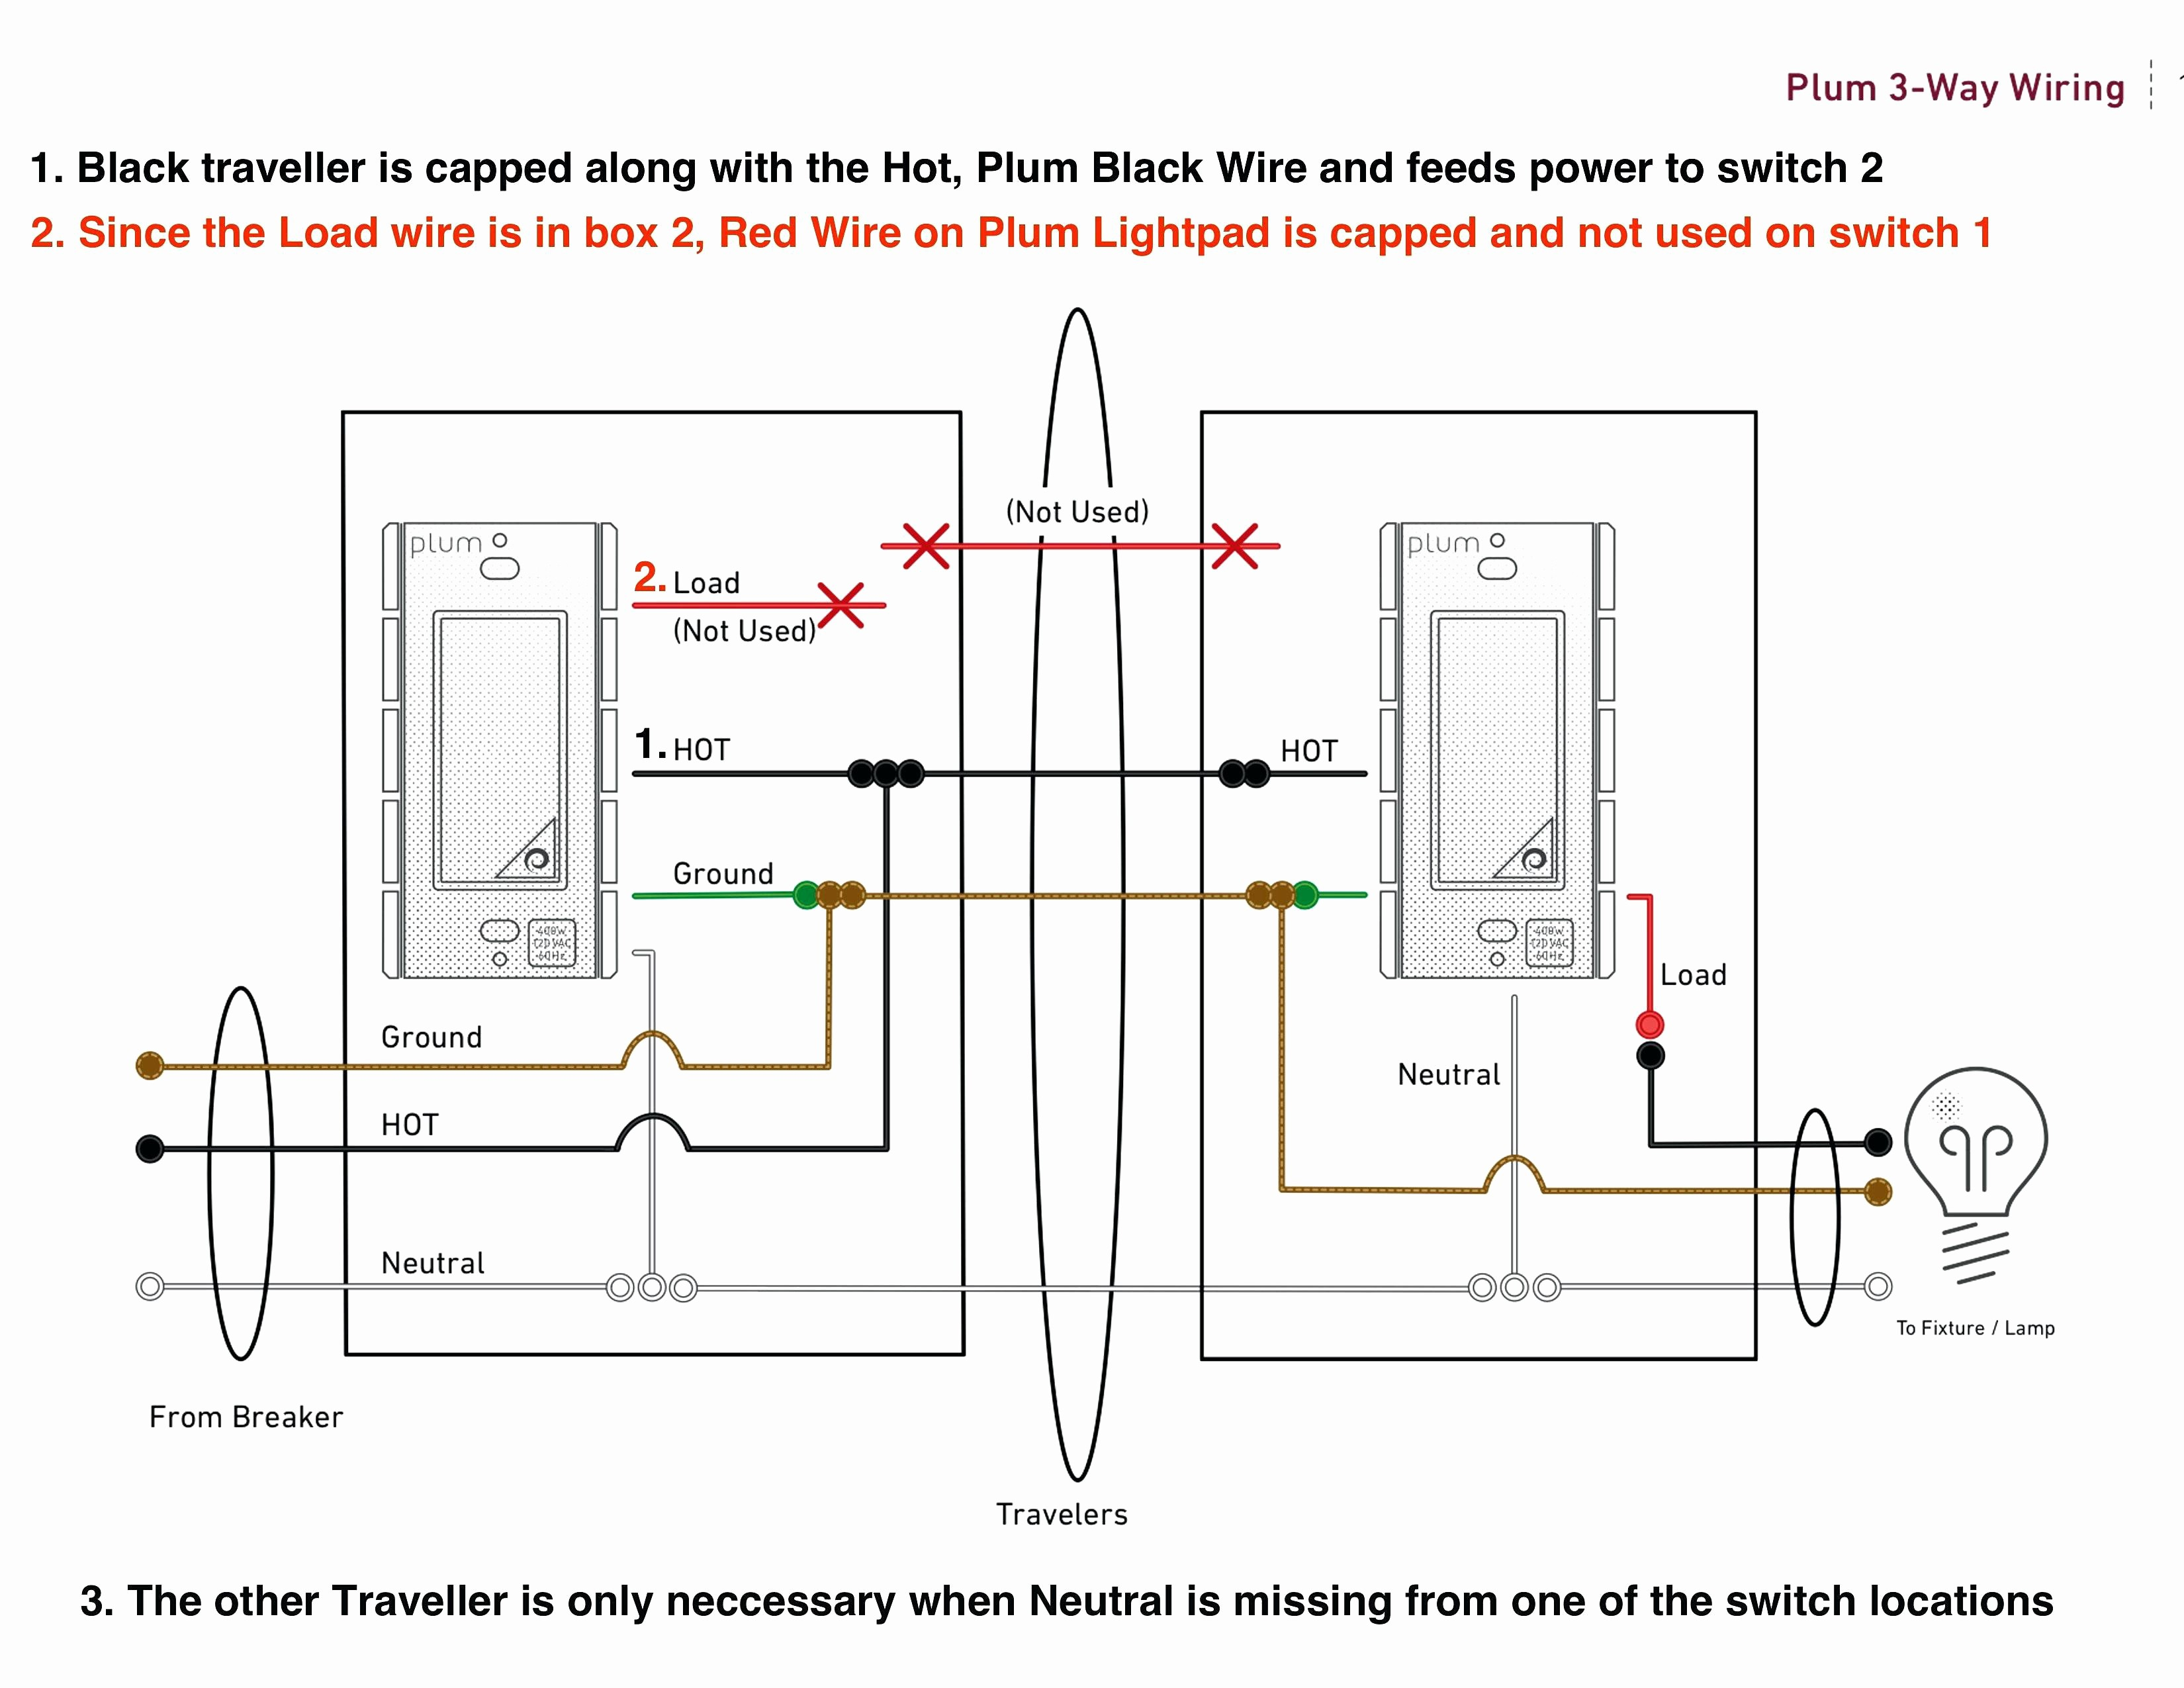 6 Volt Positive Ground Wiring Diagram | Electrick Wiring Diagram @co - 6 Volt Positive Ground Wiring Diagram